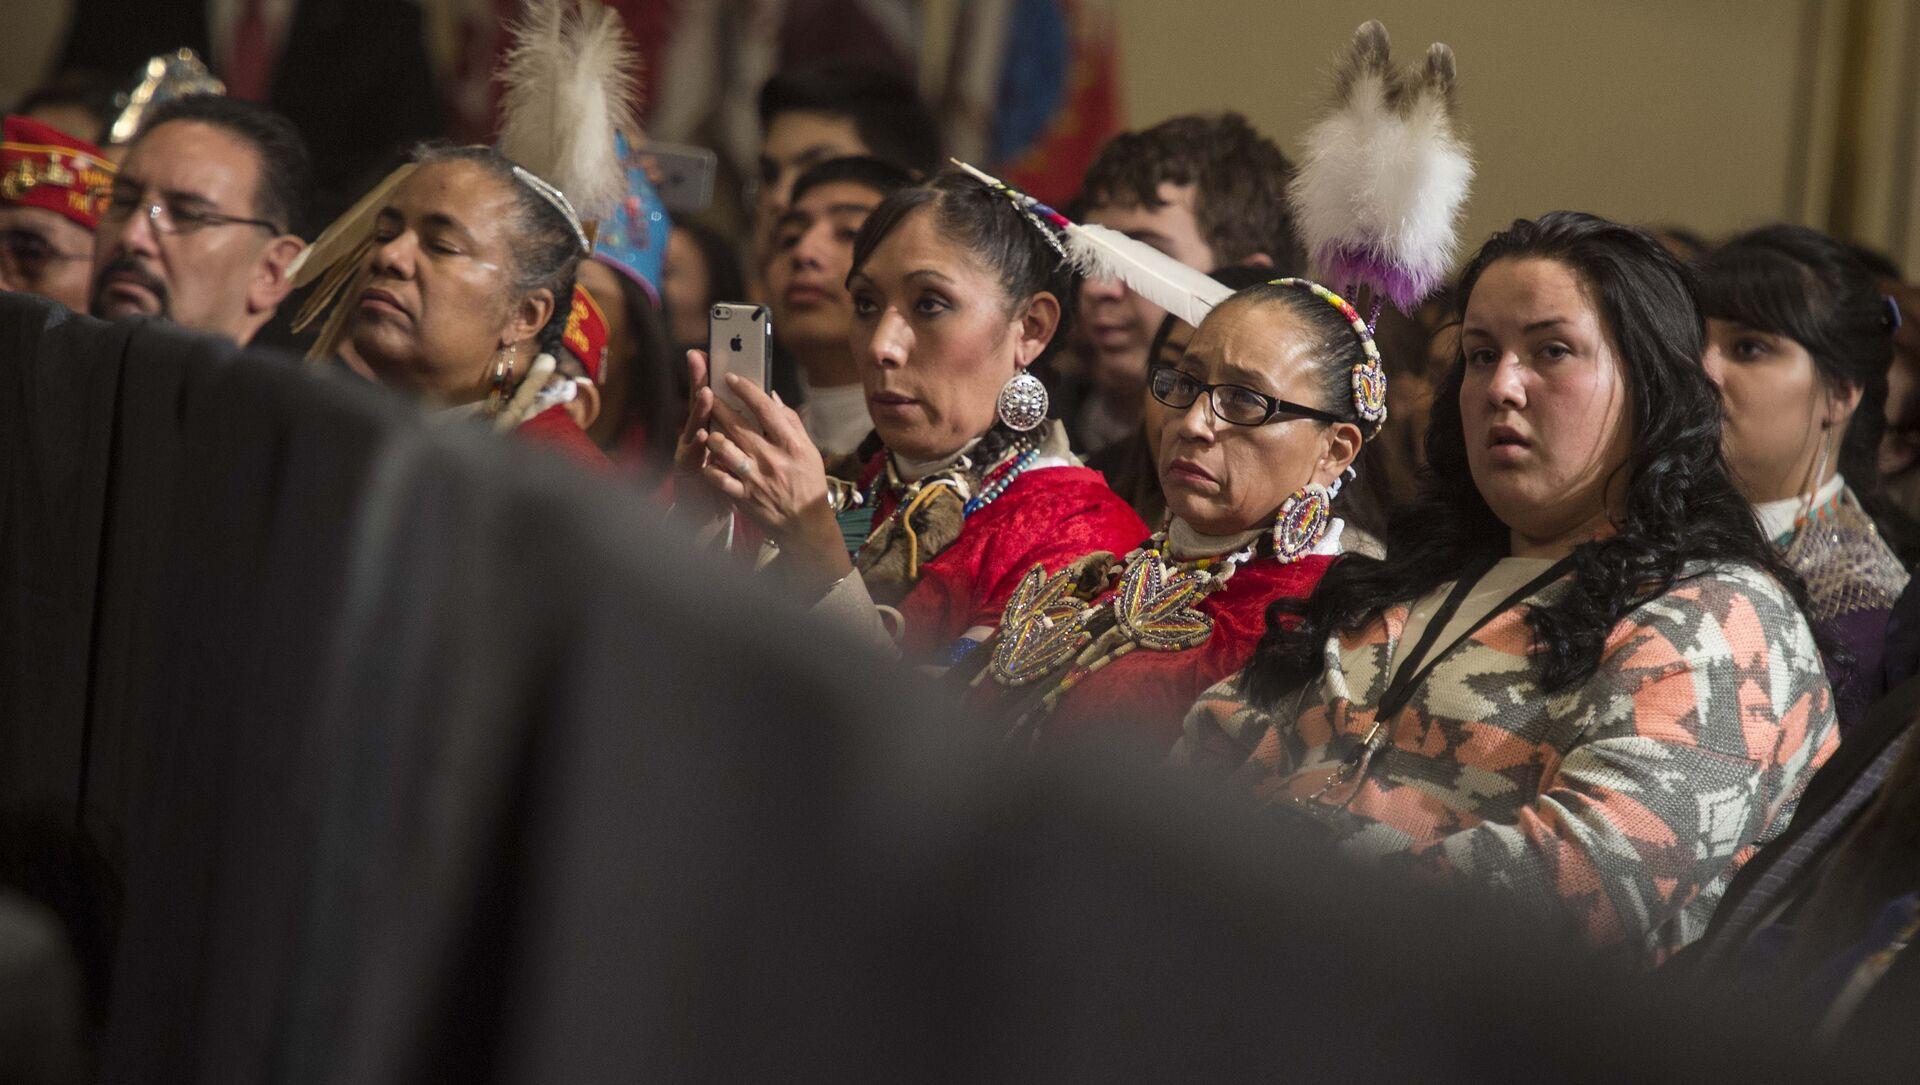 Native Americans listen to US President Barack Obama address the White House Tribal Nations Conference in Washington. (File) - Sputnik International, 1920, 29.07.2021